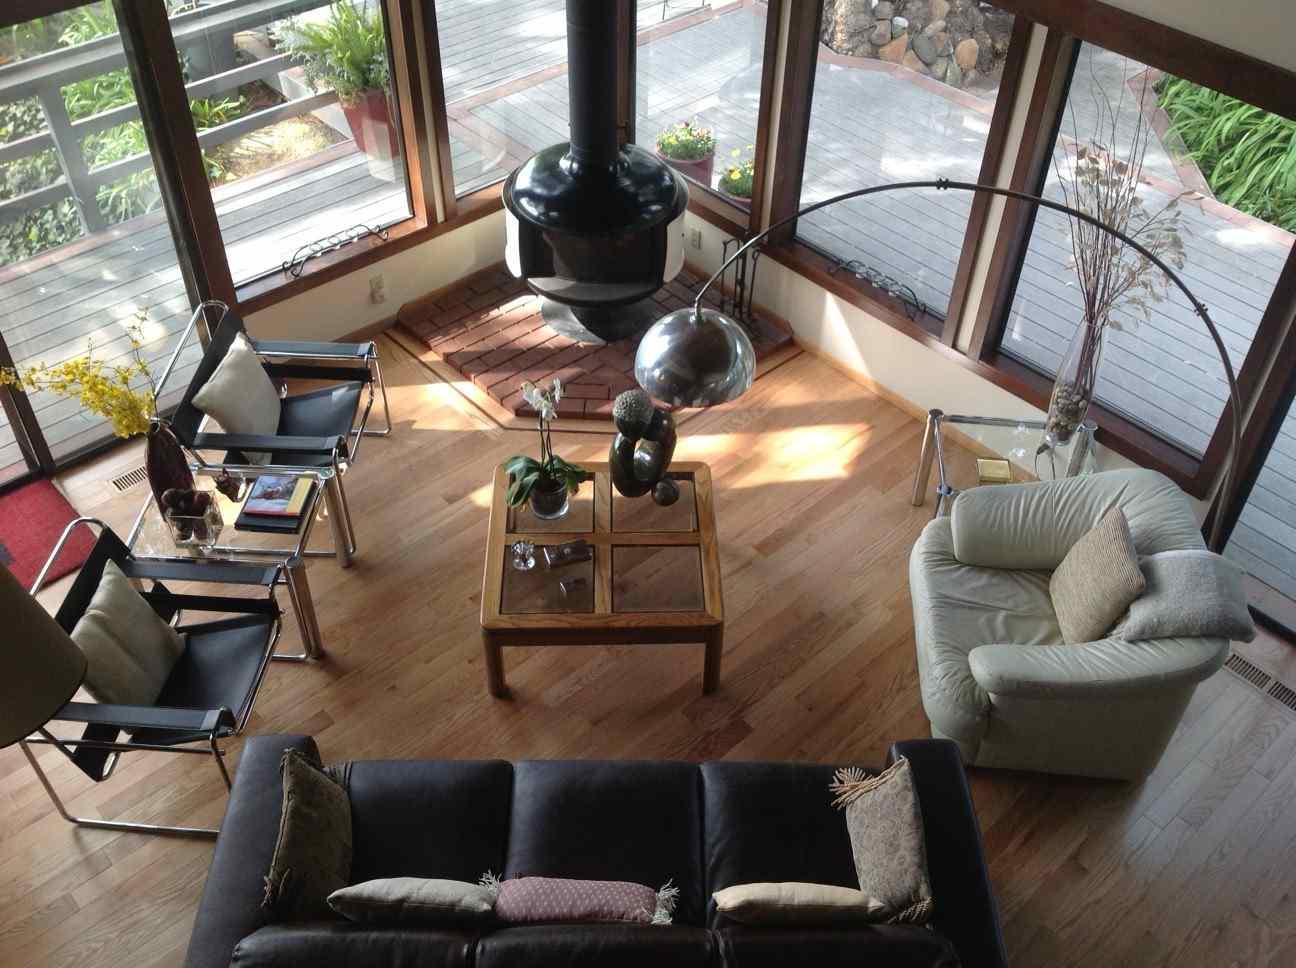 Oak Hardwood Floors Installed in Living Room